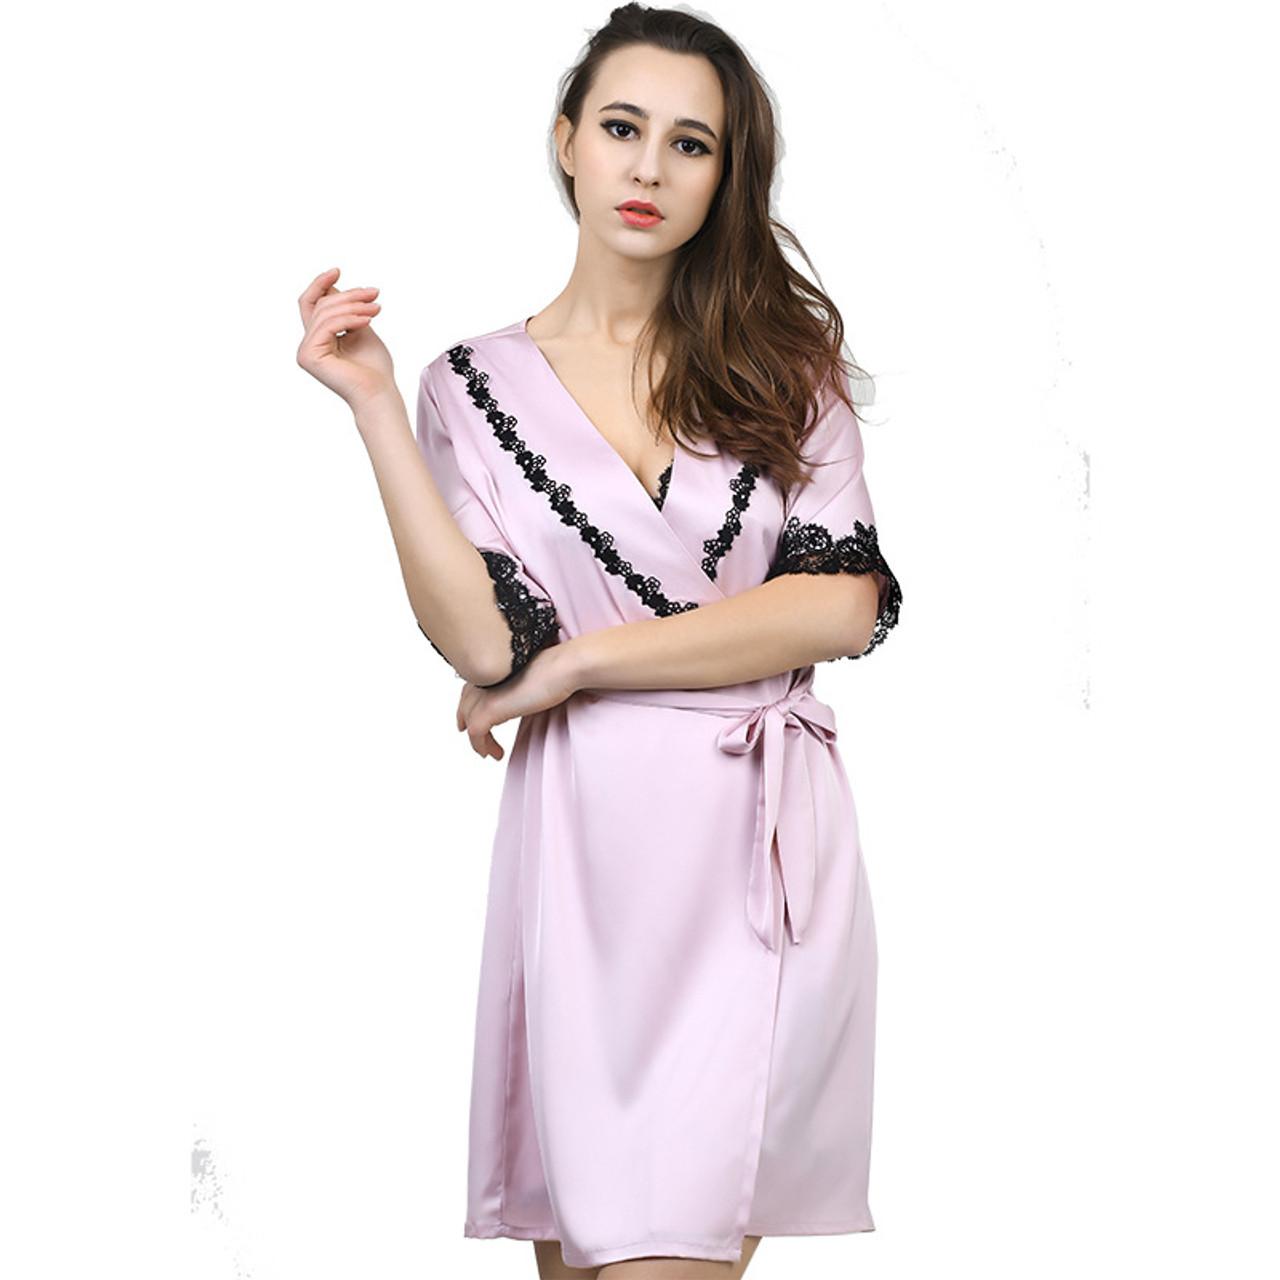 8cd7402d55 ... 1931 Sexy Women Lace Silk Satin Kimono Bathrobe Nightgown robe Sets  Half Sleeve Lingerie Pajamas Sleepwear ...